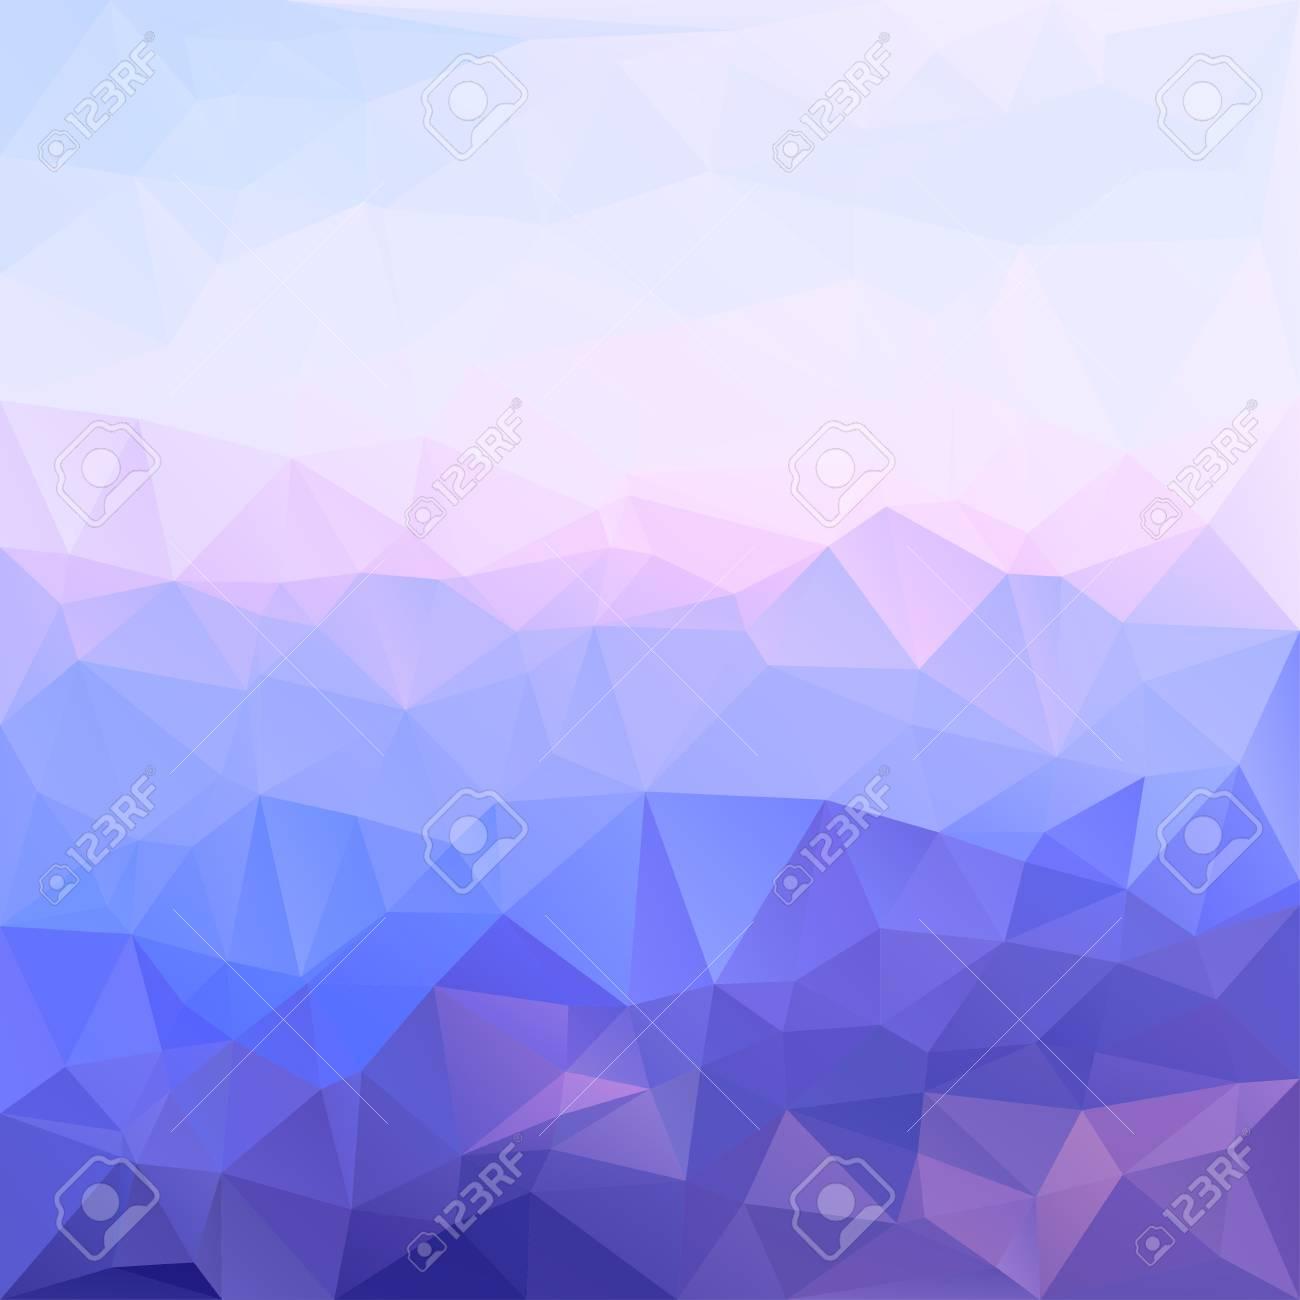 Paisaje De Fondo De Geometría Abstracta De Mosaico Poligonal En ...